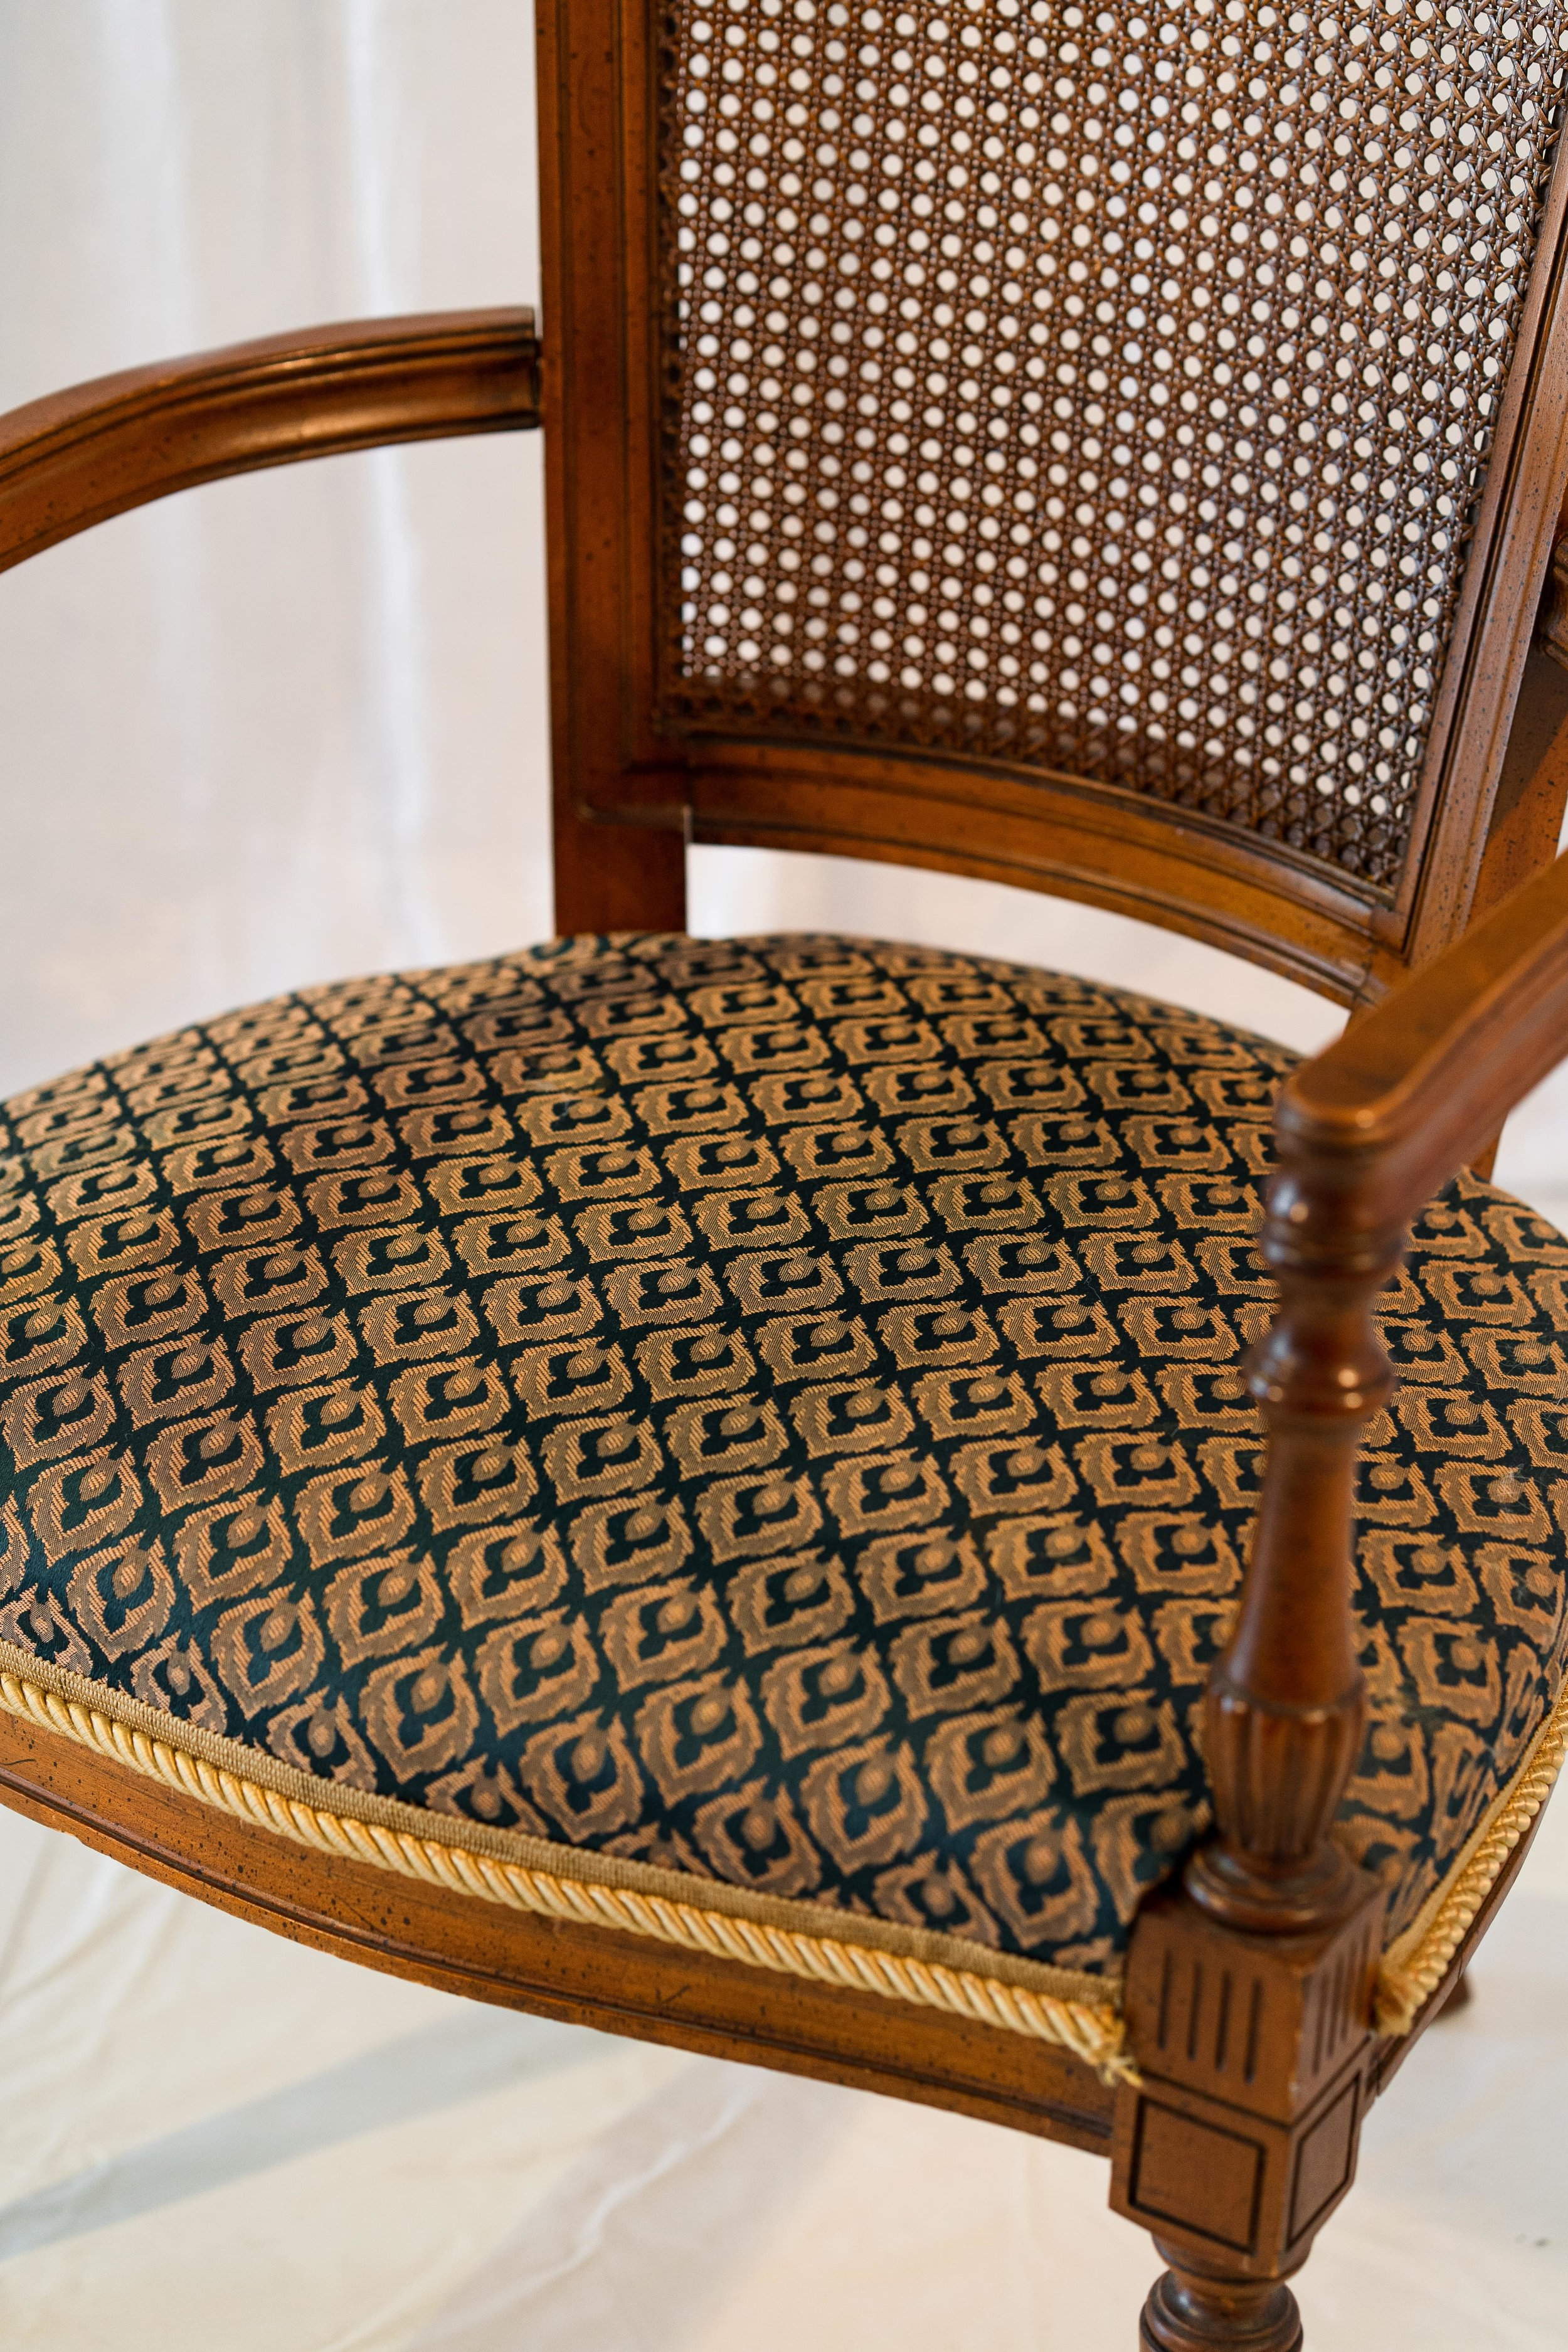 vintage chair images2-5-min.jpg